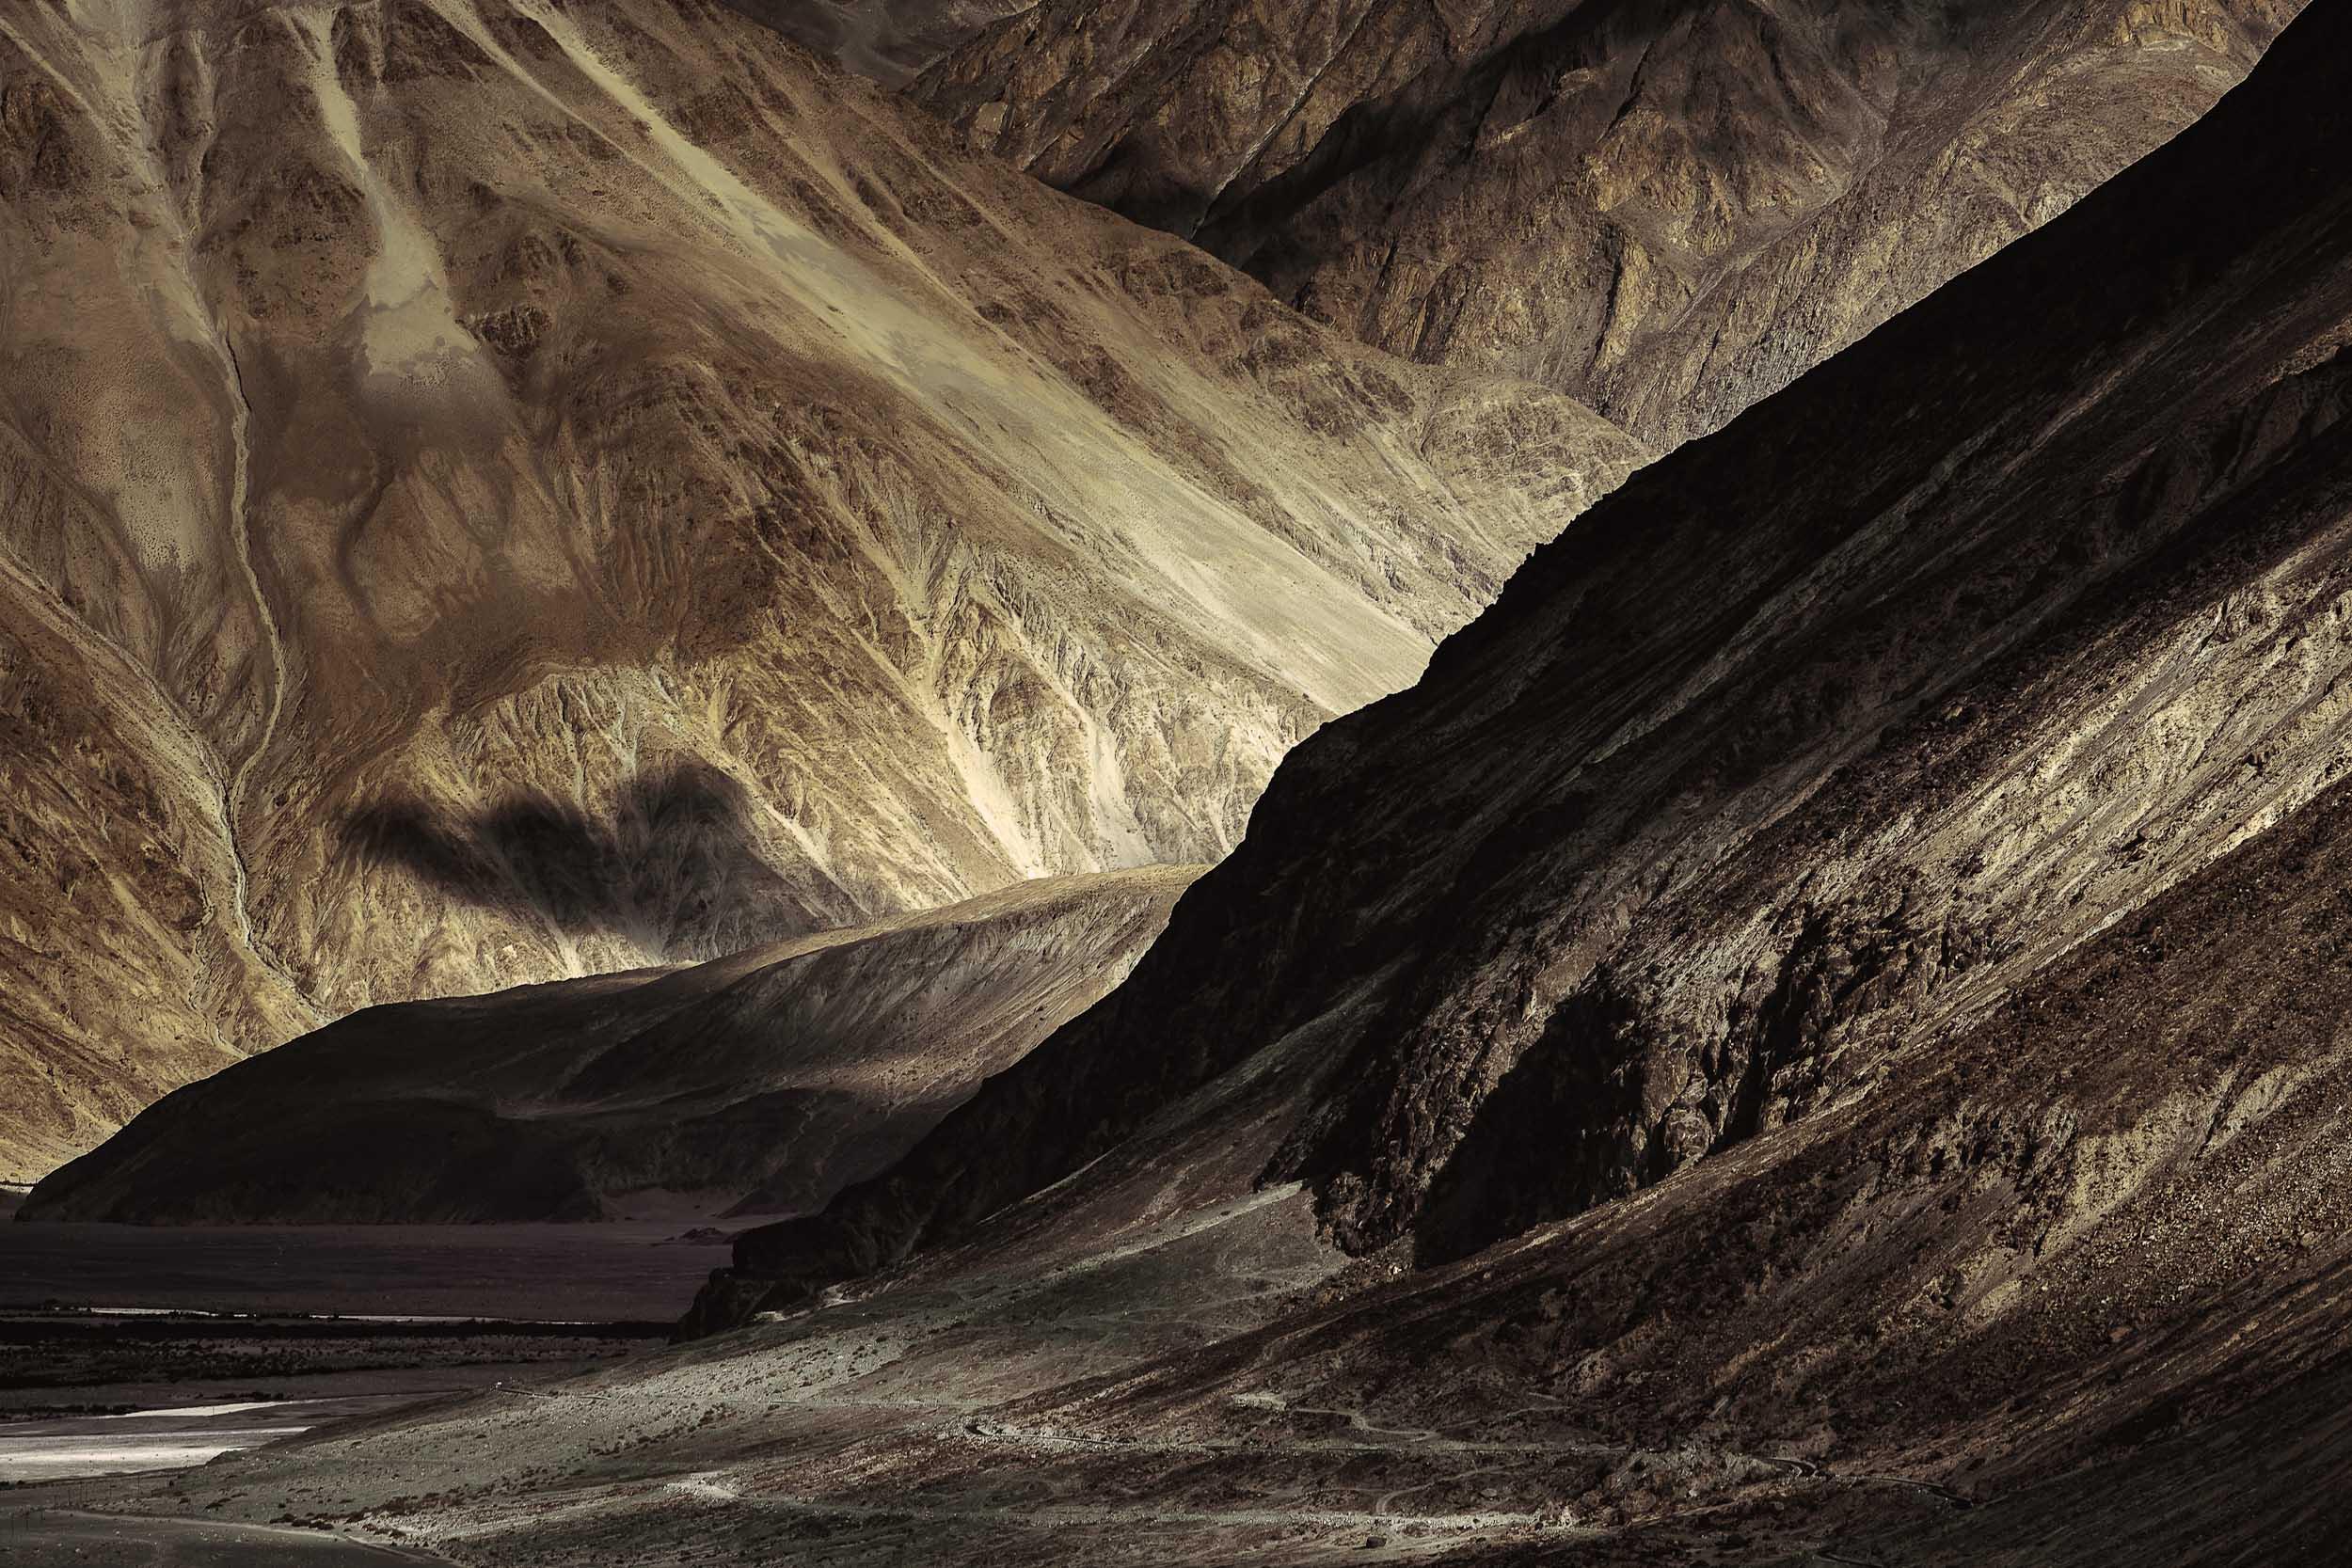 Sindhur_Photography_Travel_Landscape_Ladakh-12.JPG